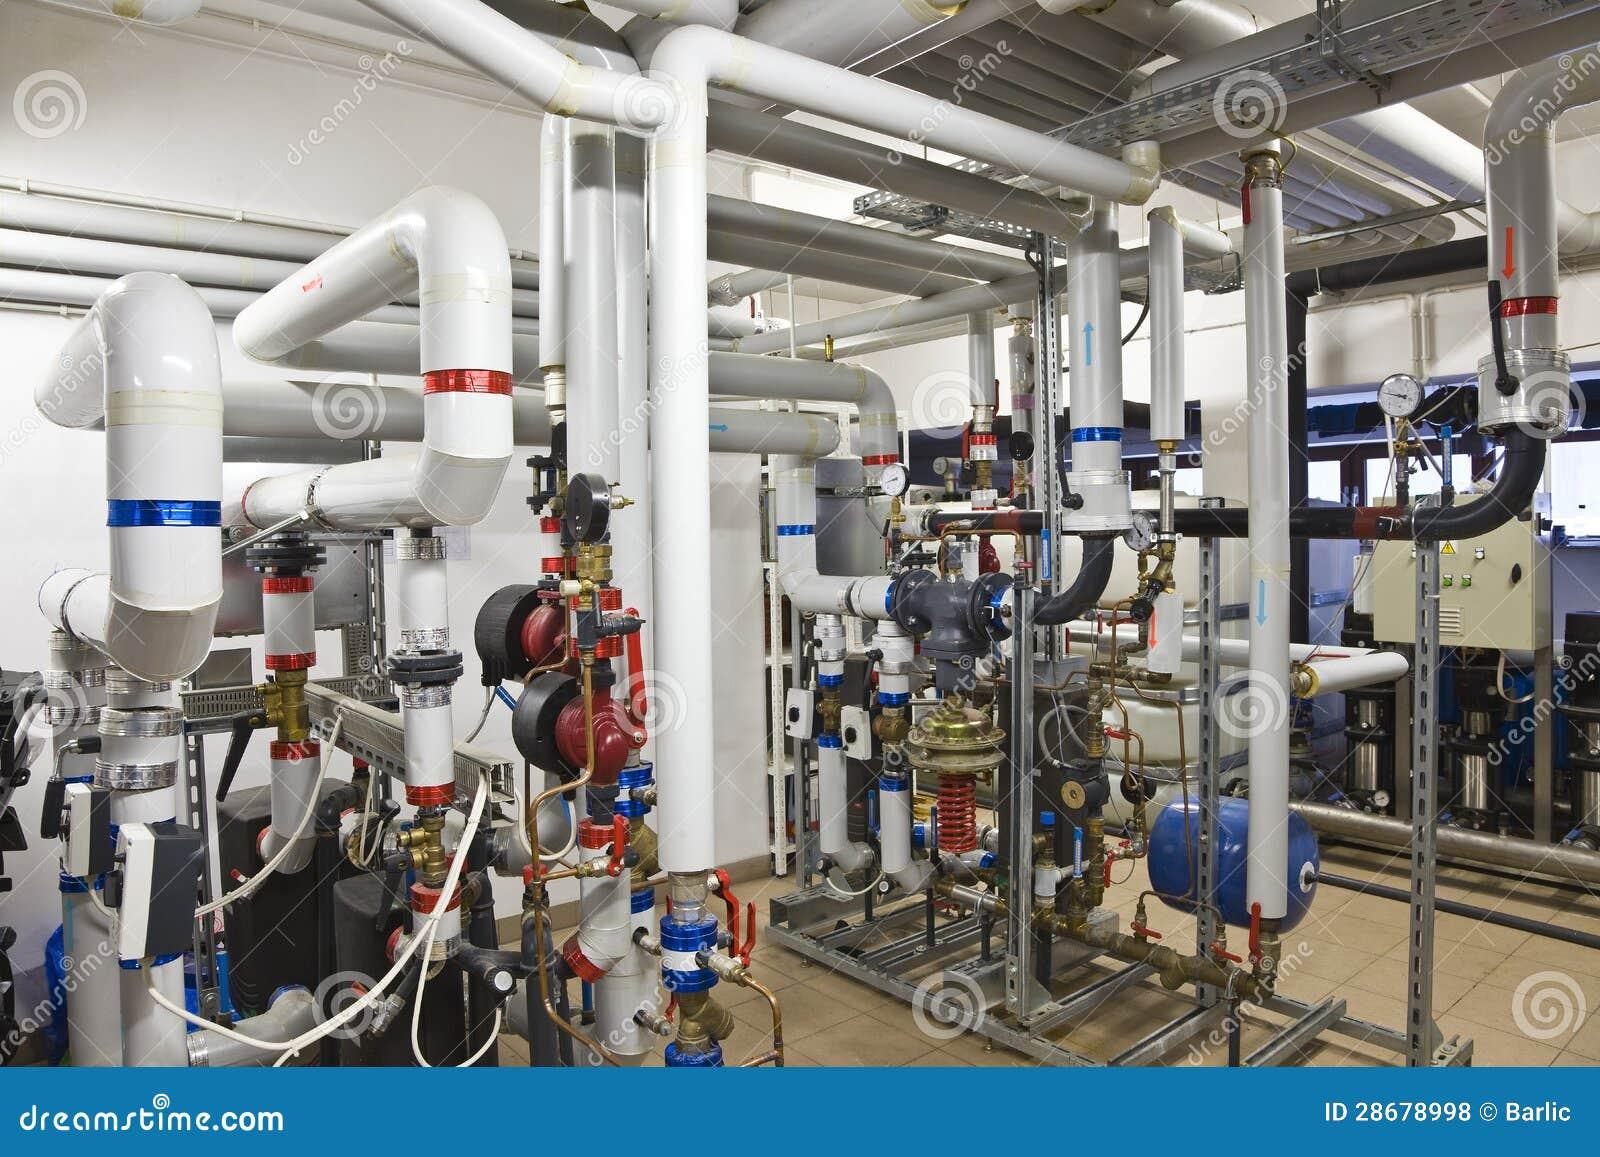 Heat Exchanger Plant Stock Photo Image Of Metal